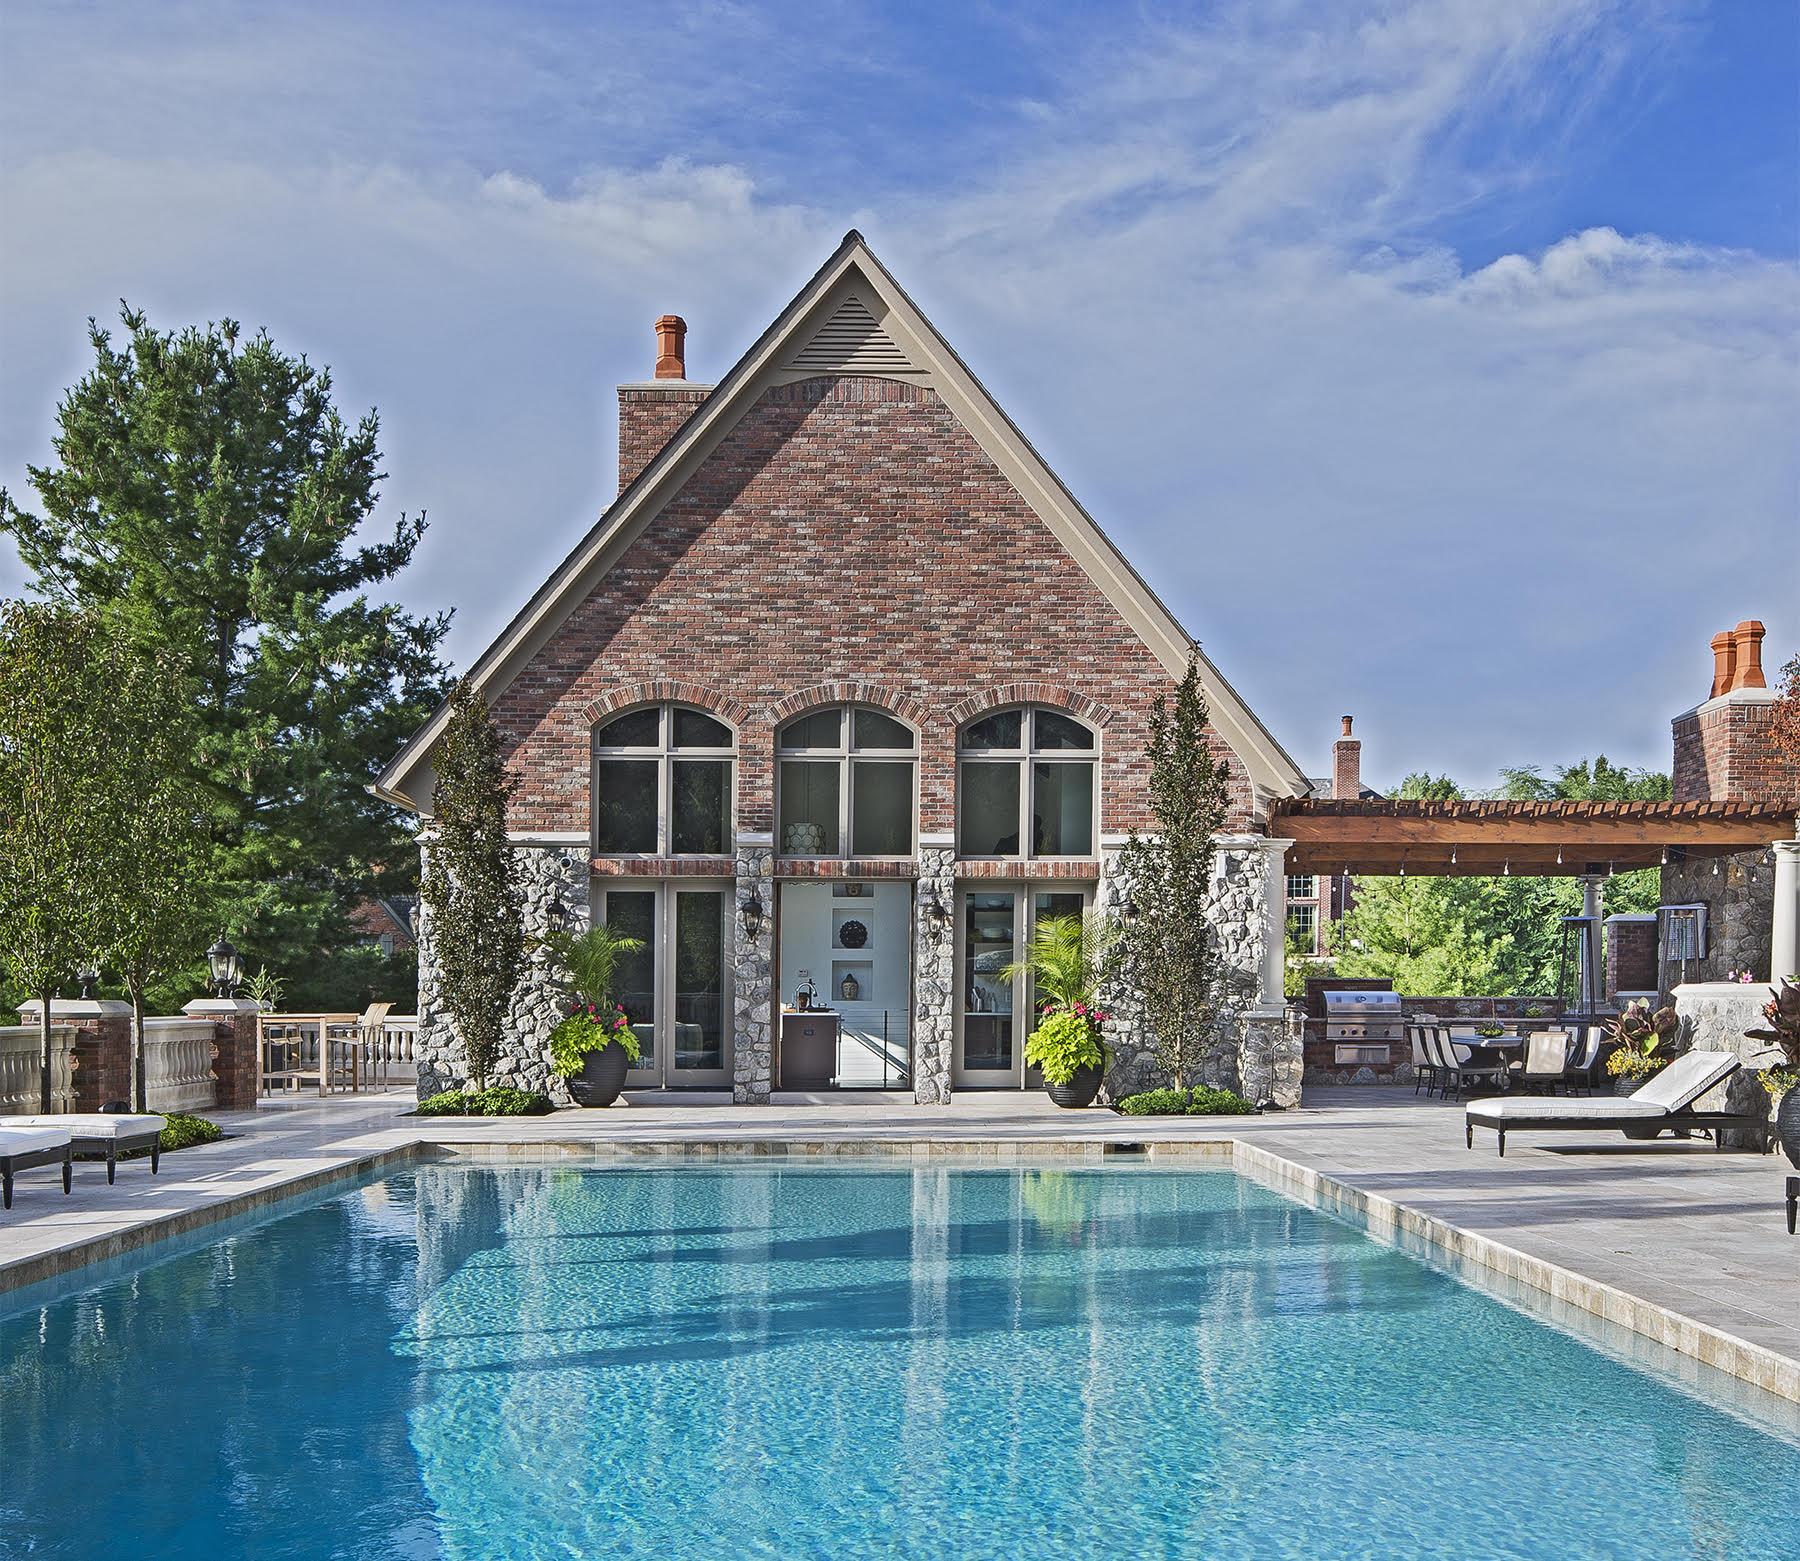 Pool House Exterior.jpg